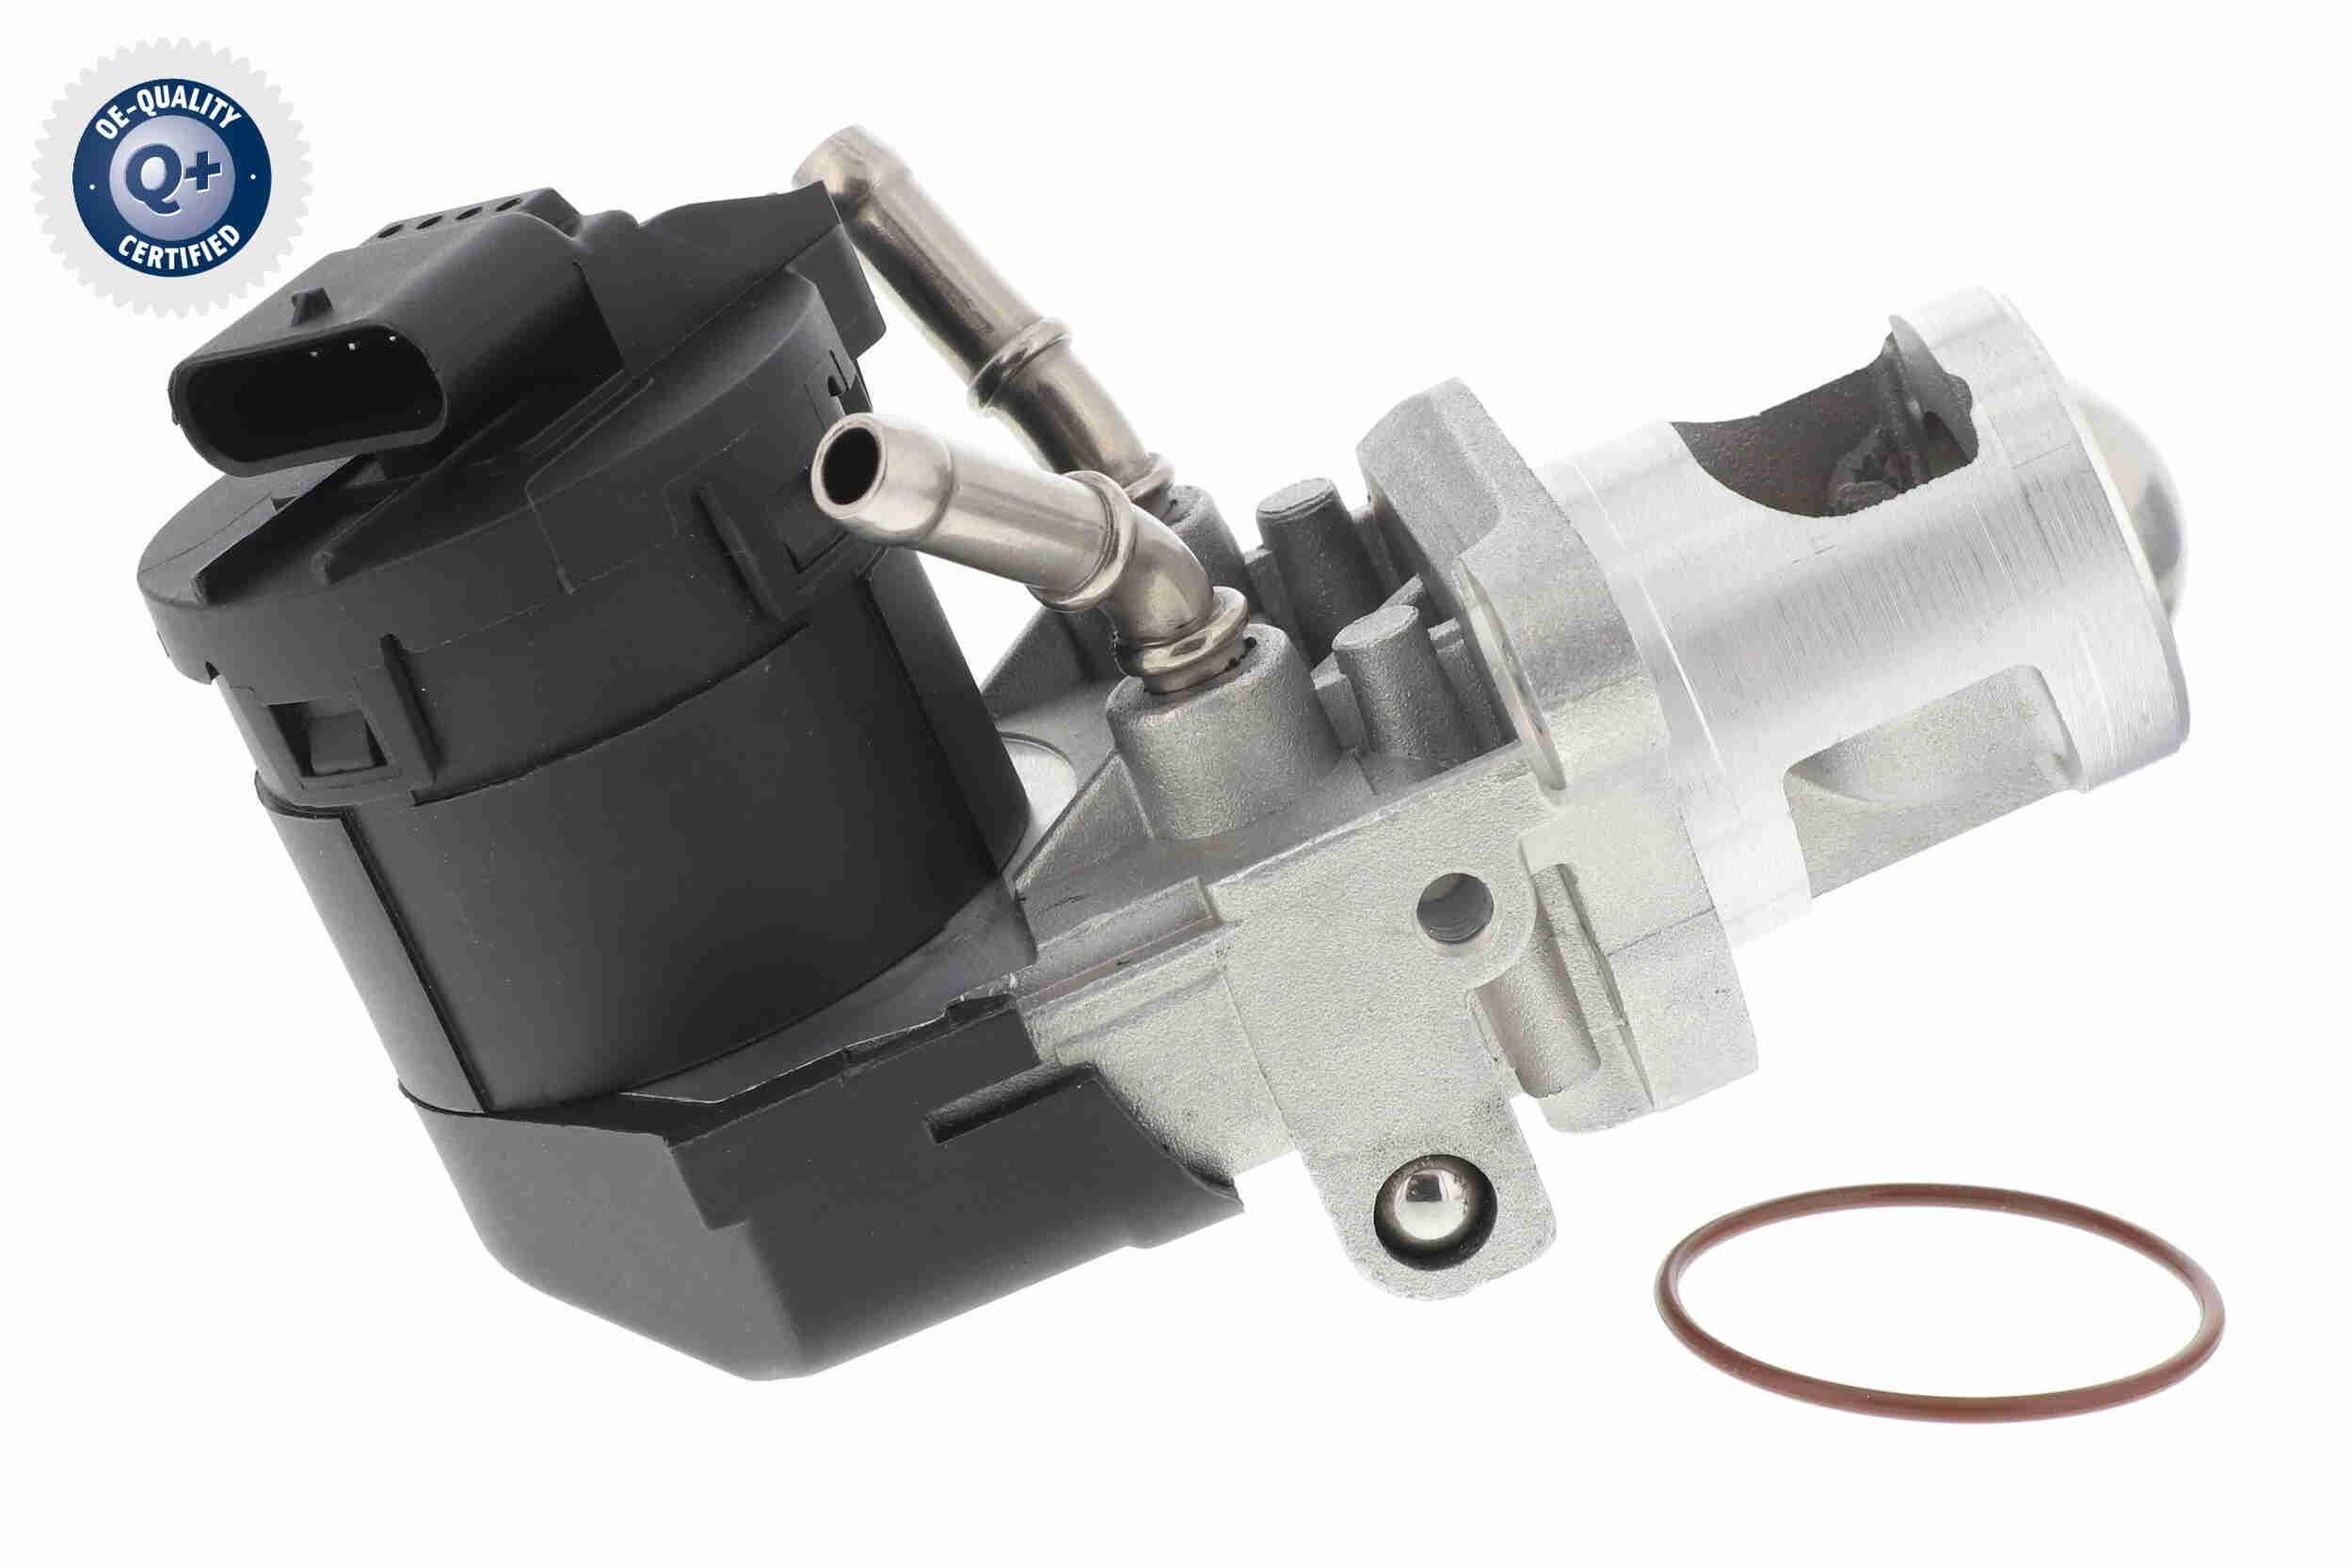 BMW E91 320d 2011 reservdelar: EGR-Ventil VEMO V20-63-0012